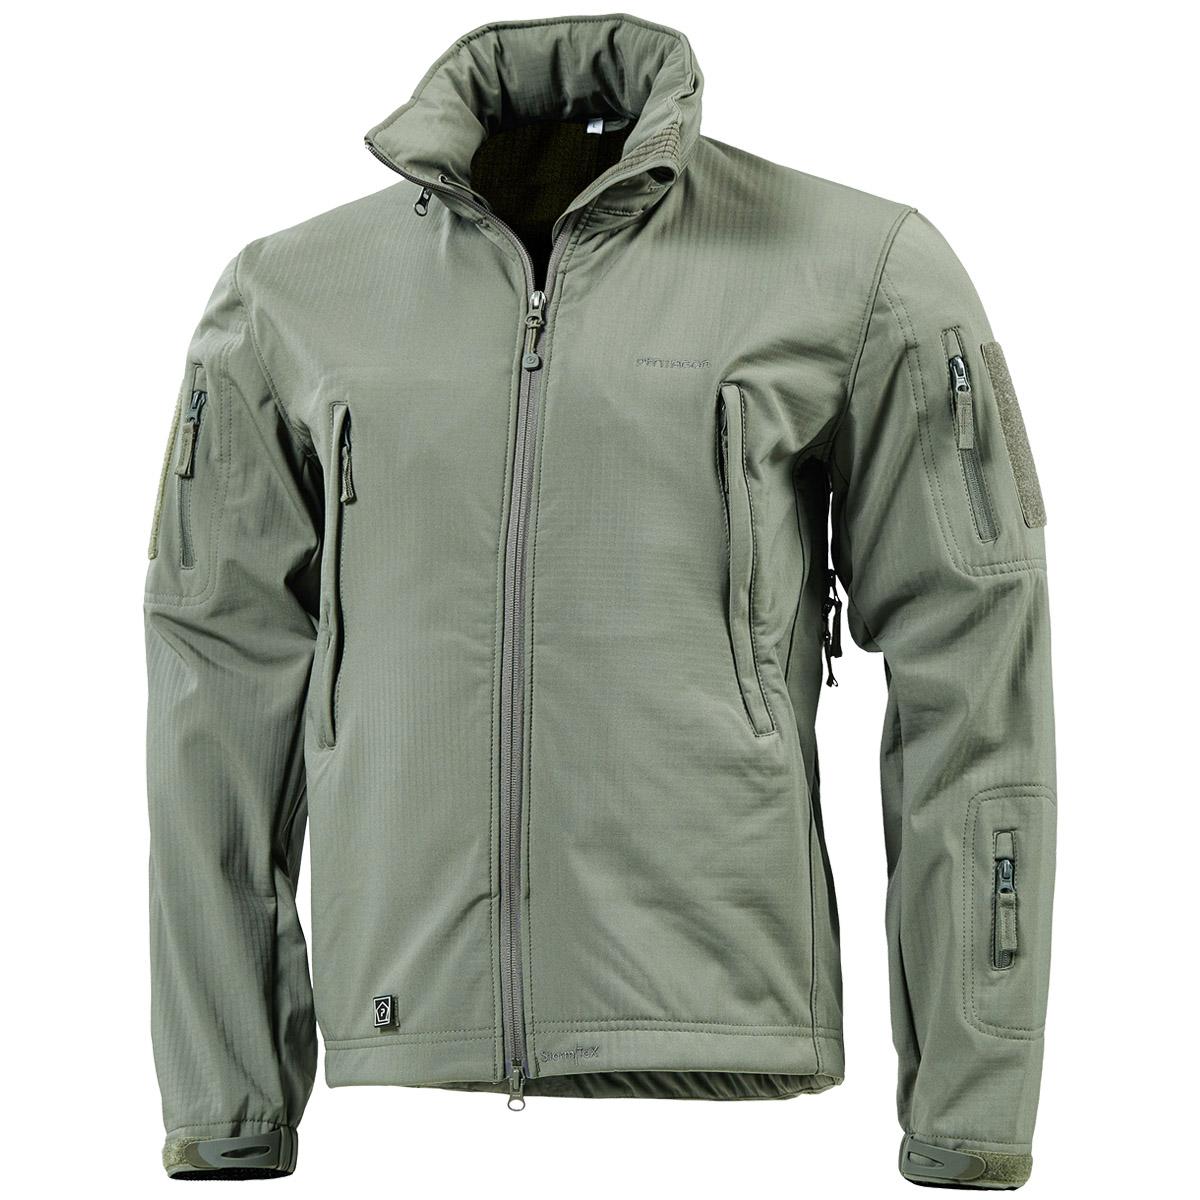 acquisto di softshell pentagon ranger green o emerson pants multicam tropic Pentagon_artaxes_grindle_1